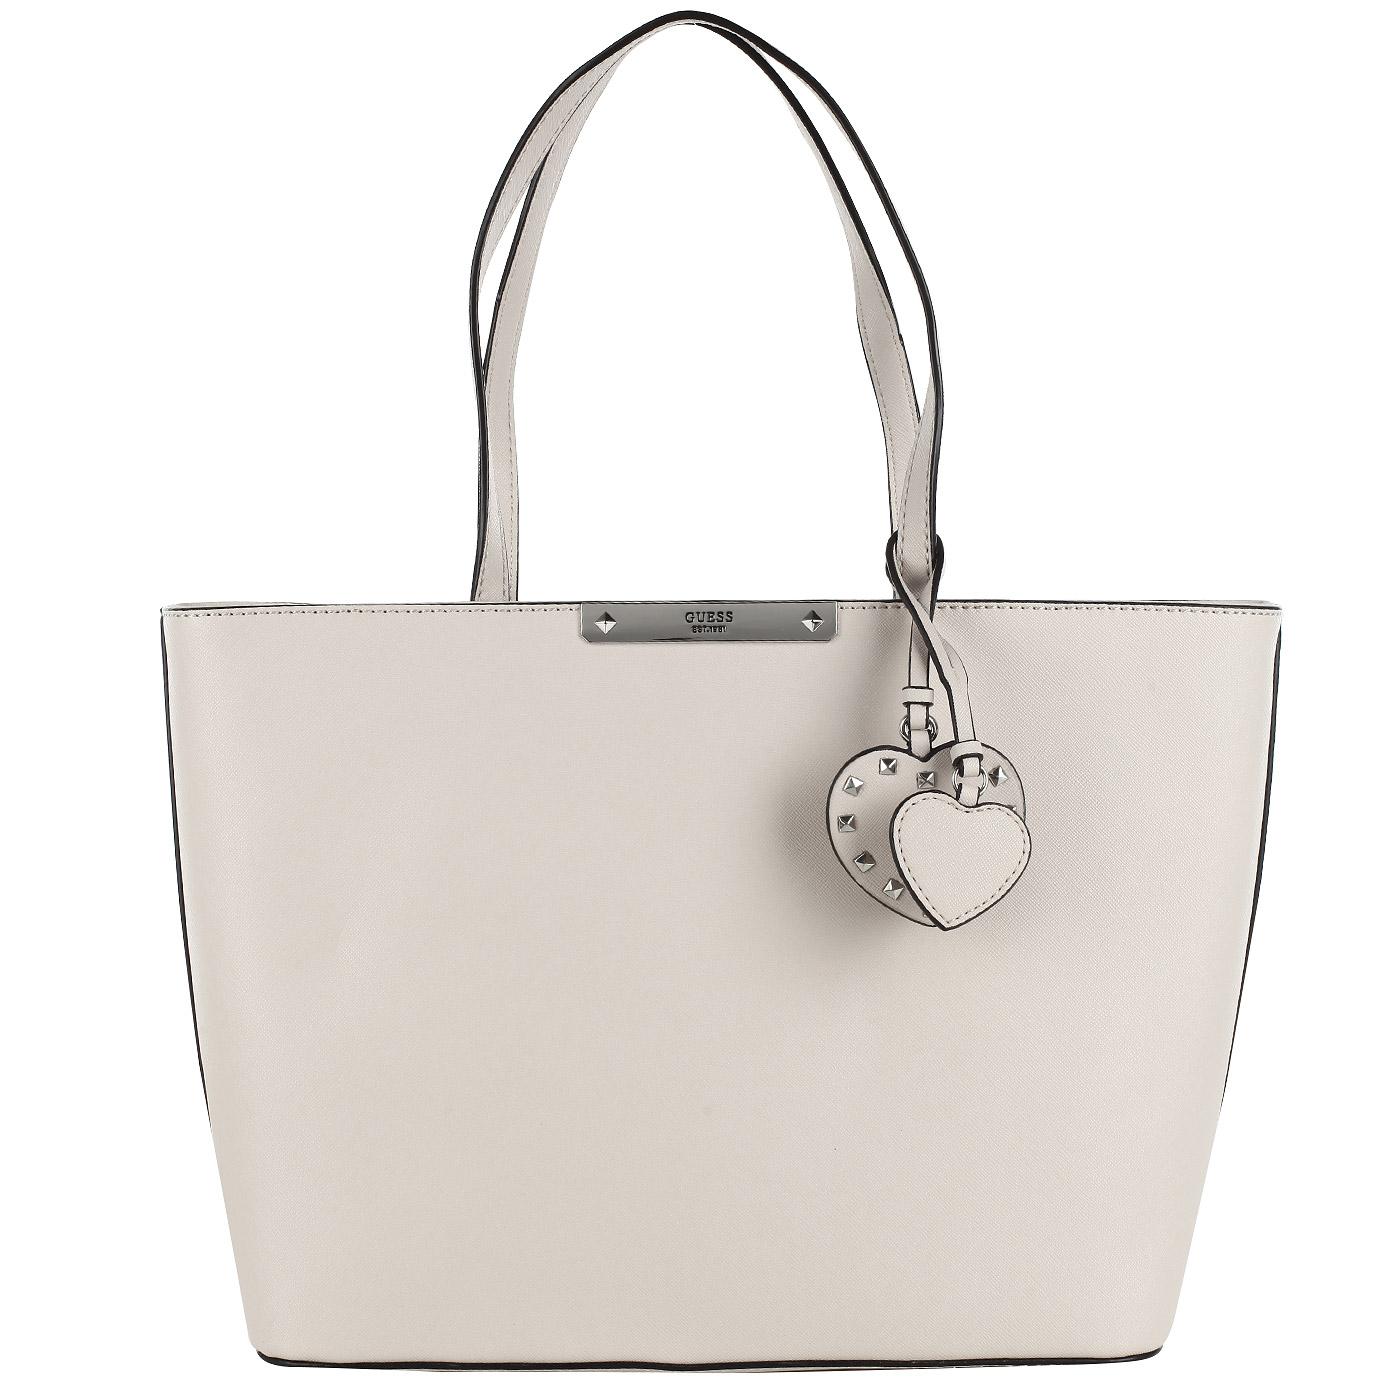 6b093d9bd921 Вместительная женская сумка с длинными ручками Guess Britta HWVY66 ...